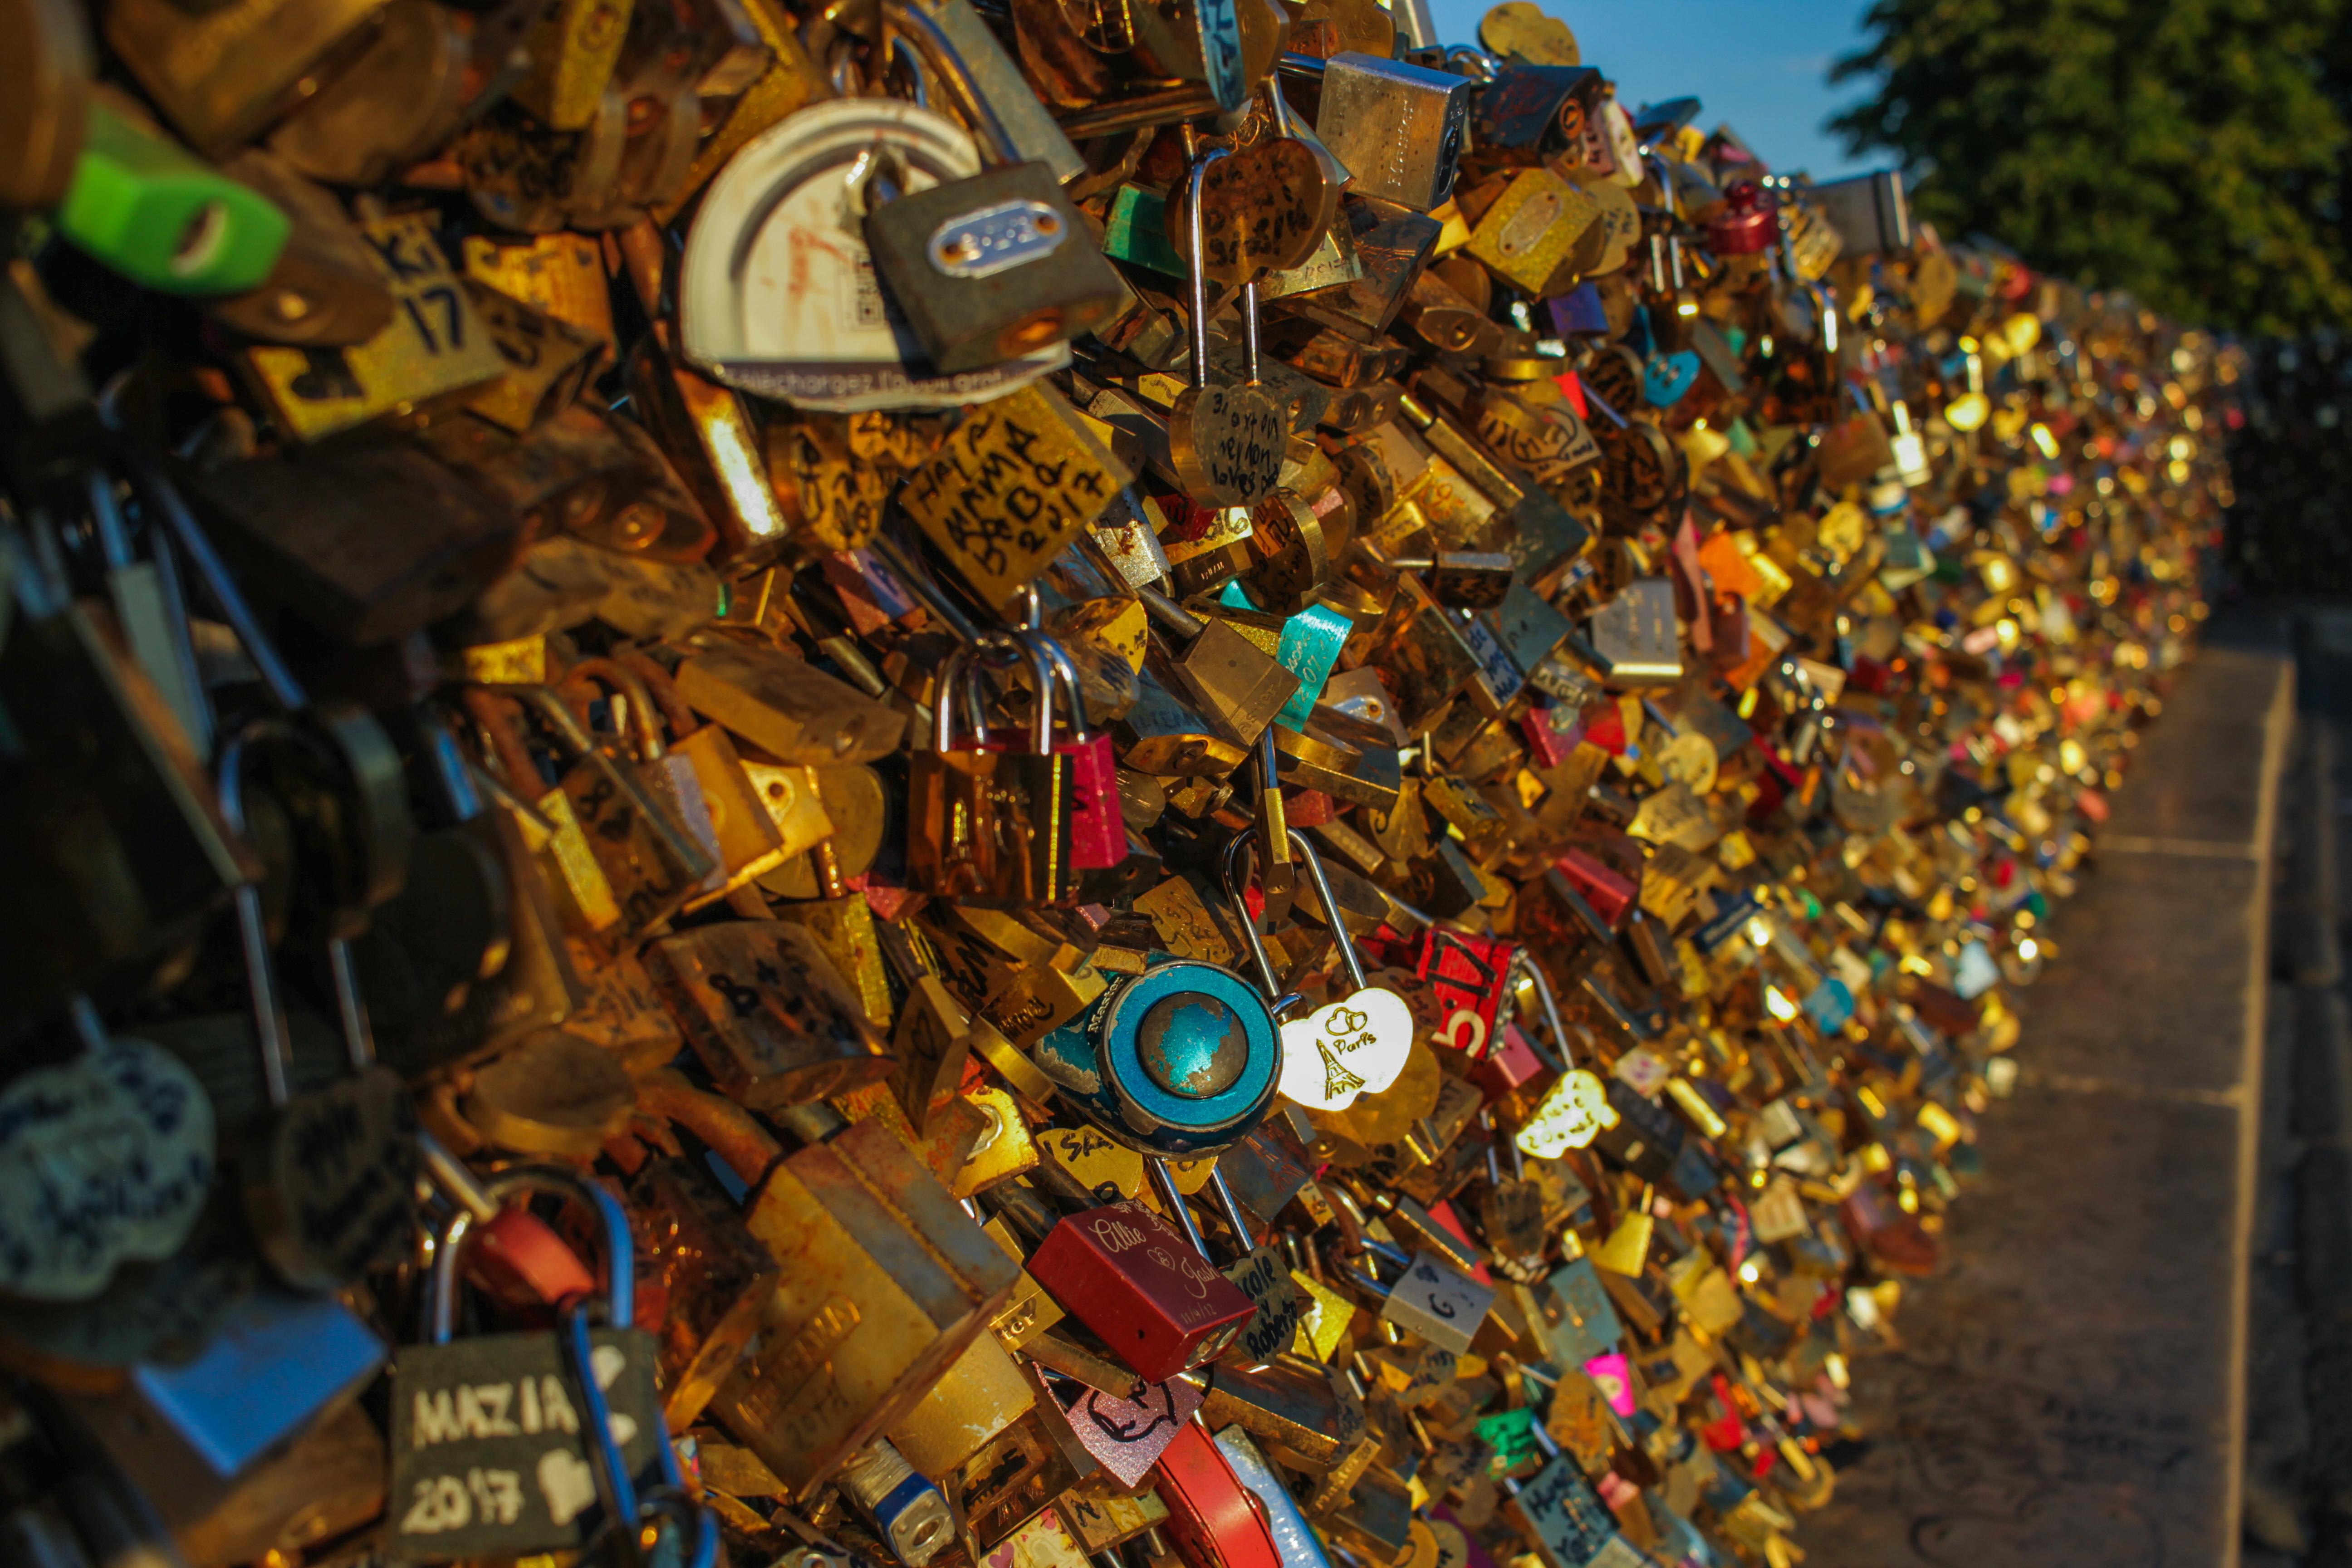 Free Images : love, locks, yellow, waste, scrap 5184x3456 - Rob ...